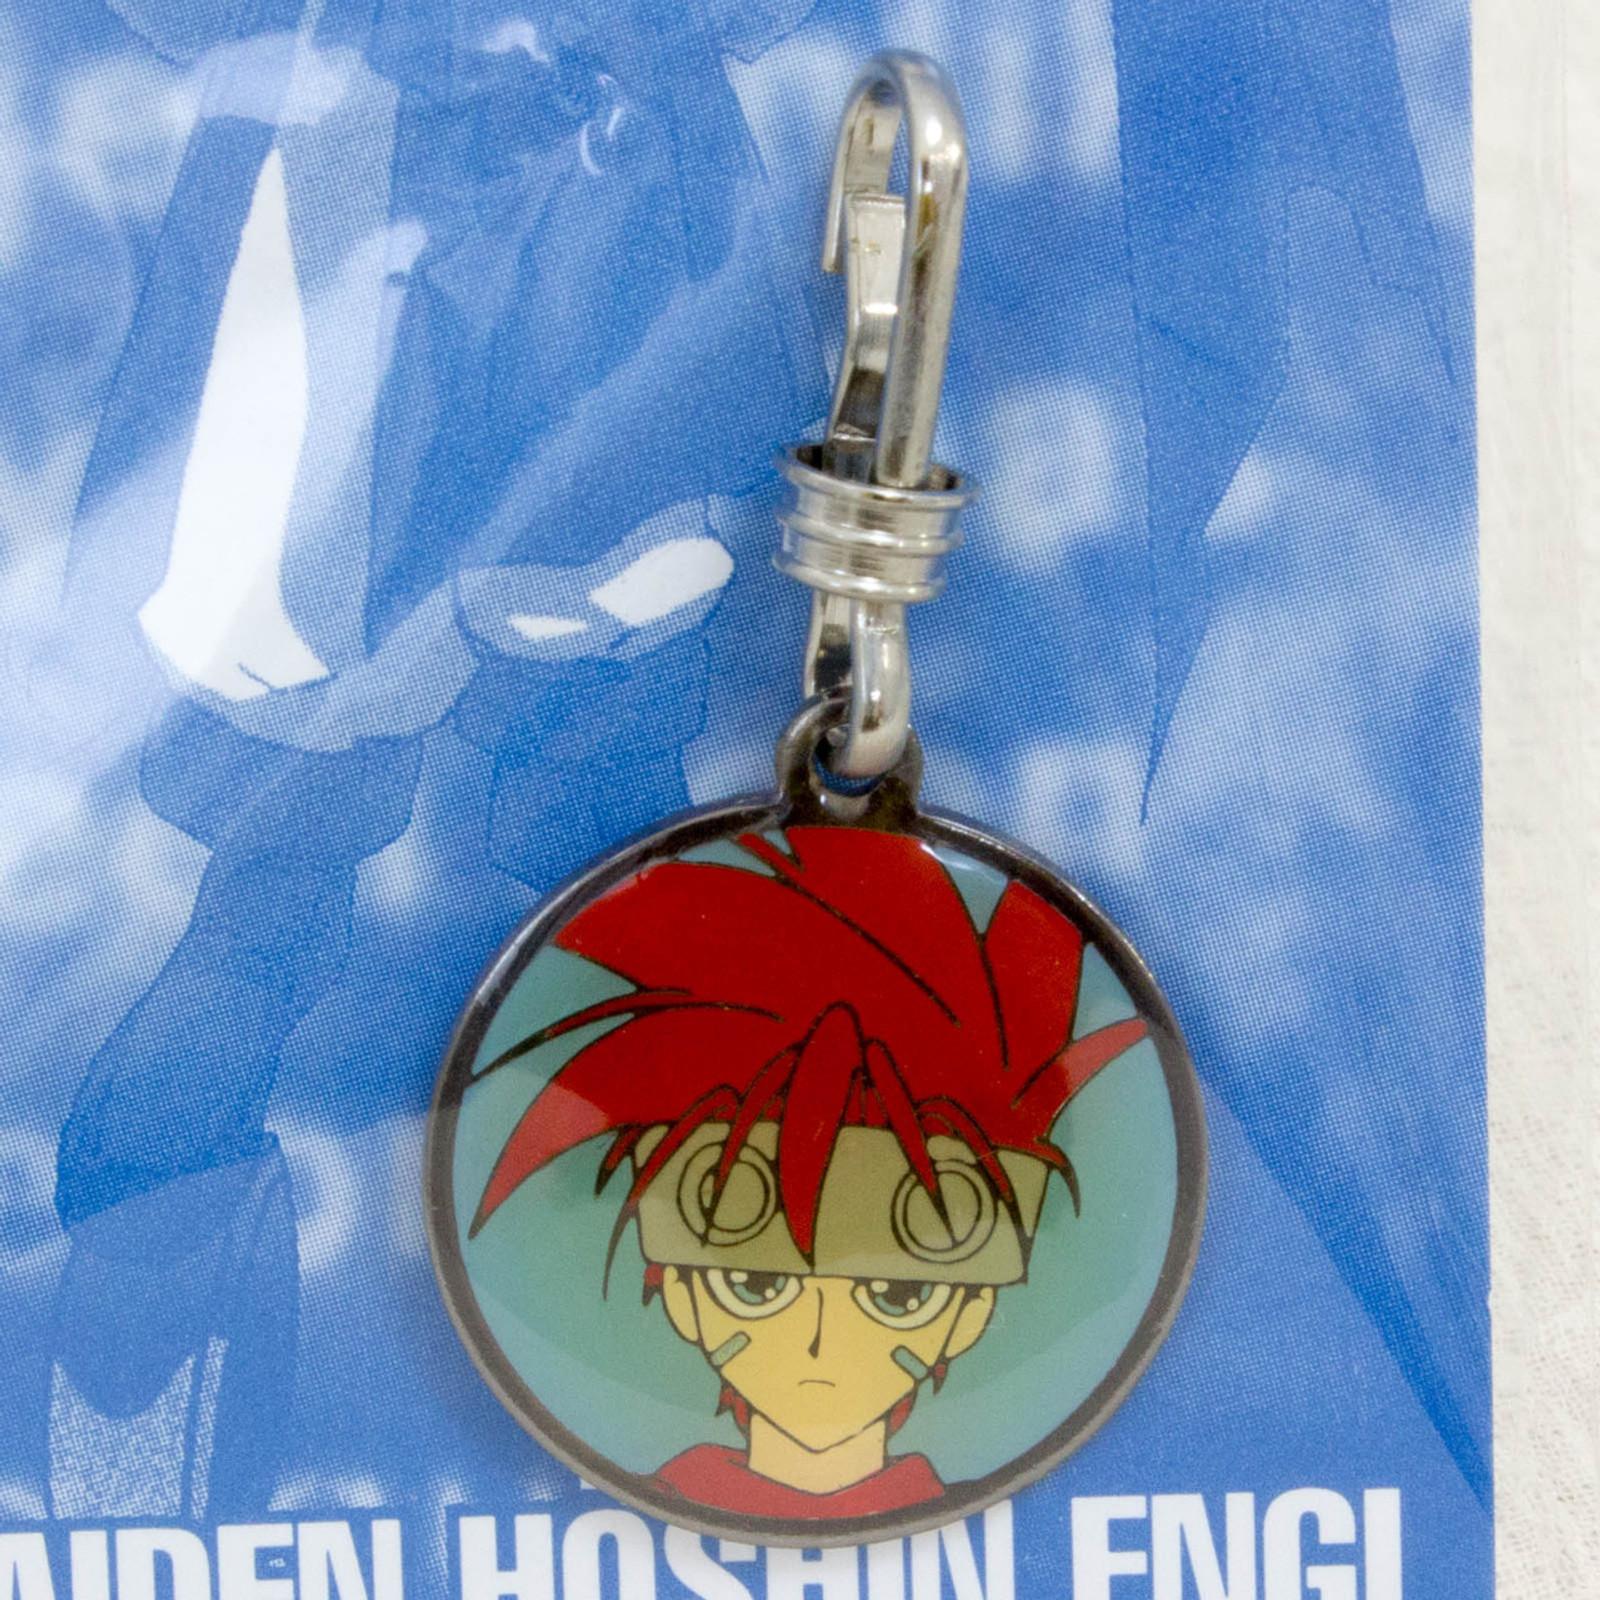 Senkaiden Hoshin Engi Nataku Fastener Mascot JAPAN ANIME MANGA